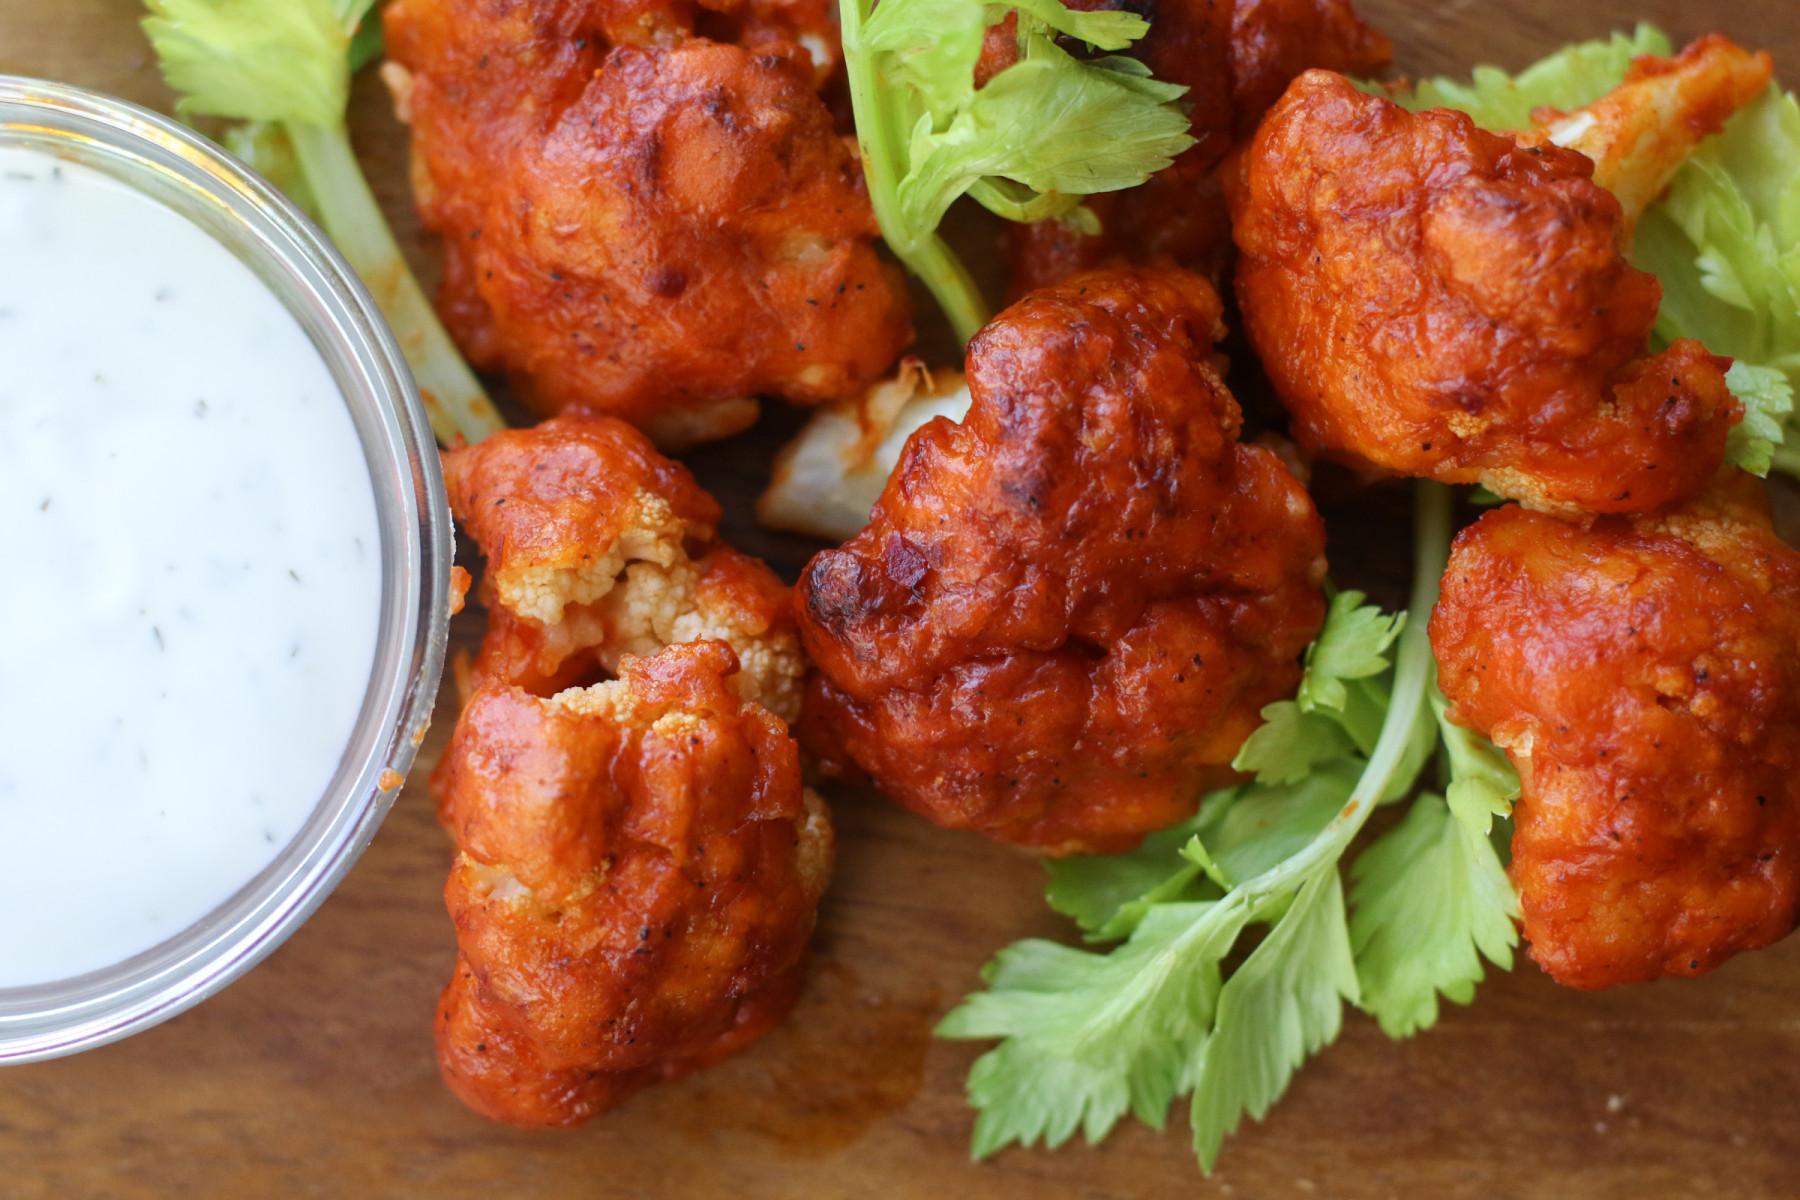 Cauliflower Chicken Wings  alex thomopoulos Crispy Gluten Free Cauliflower Buffalo